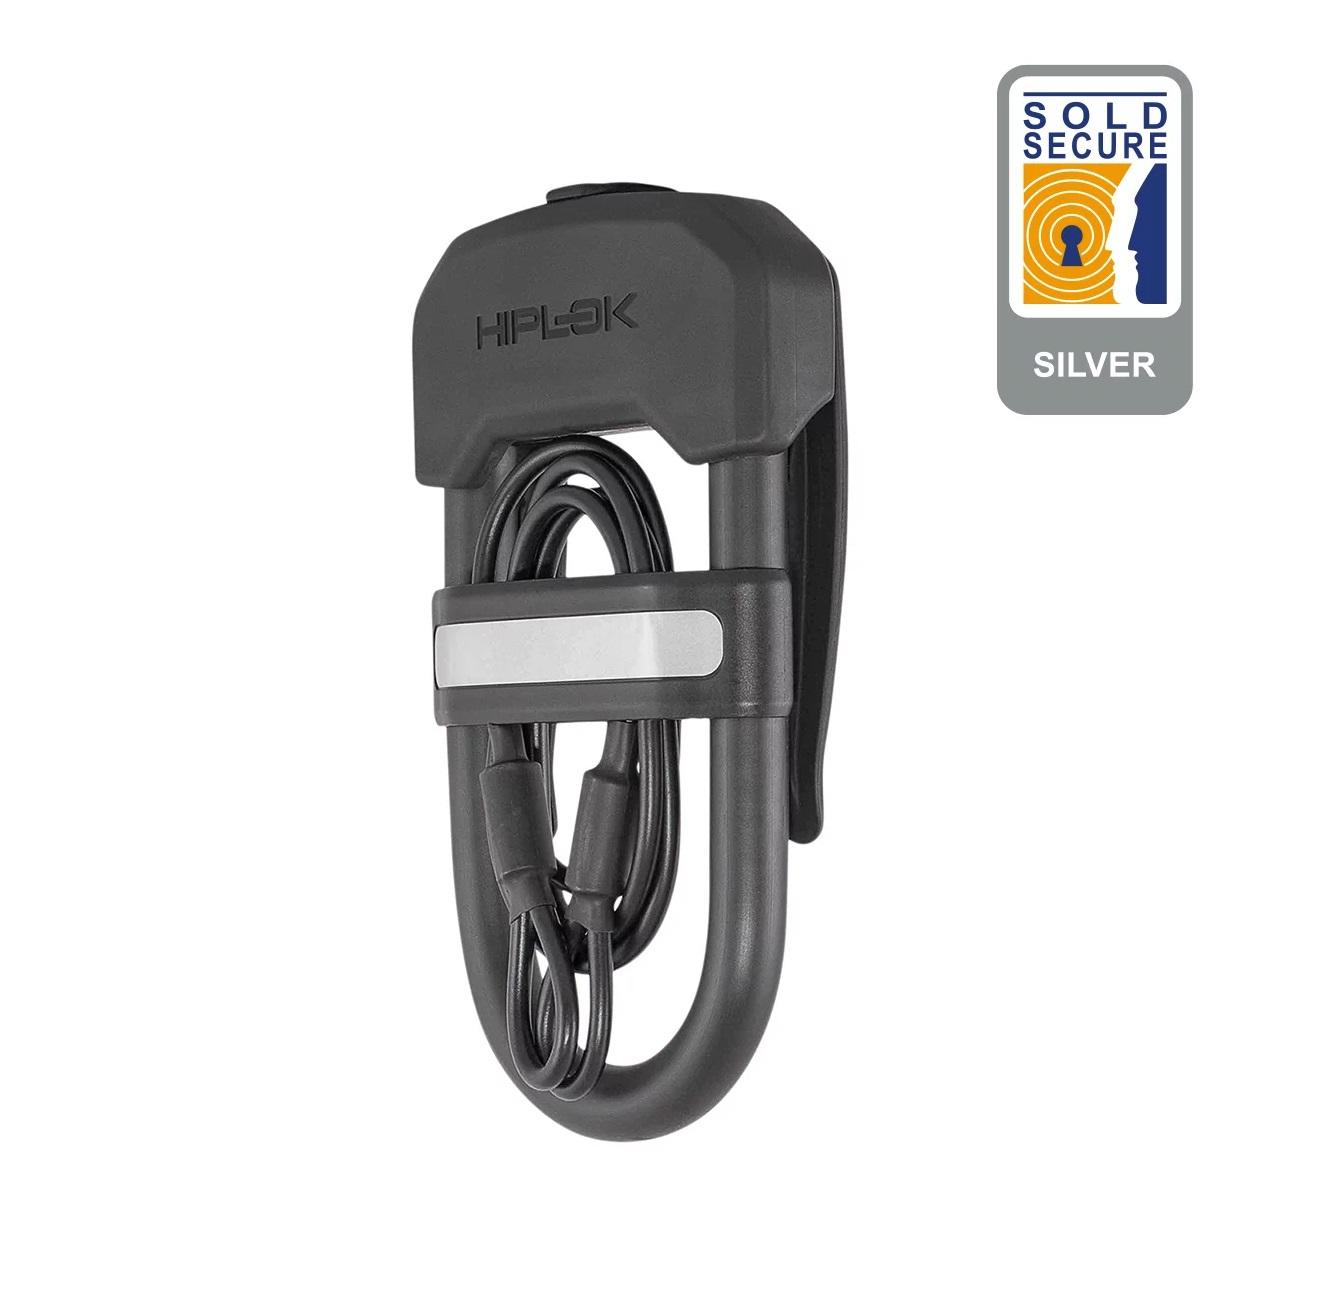 Hiplok Dc Mini D Lock With Cable | Combo Lock